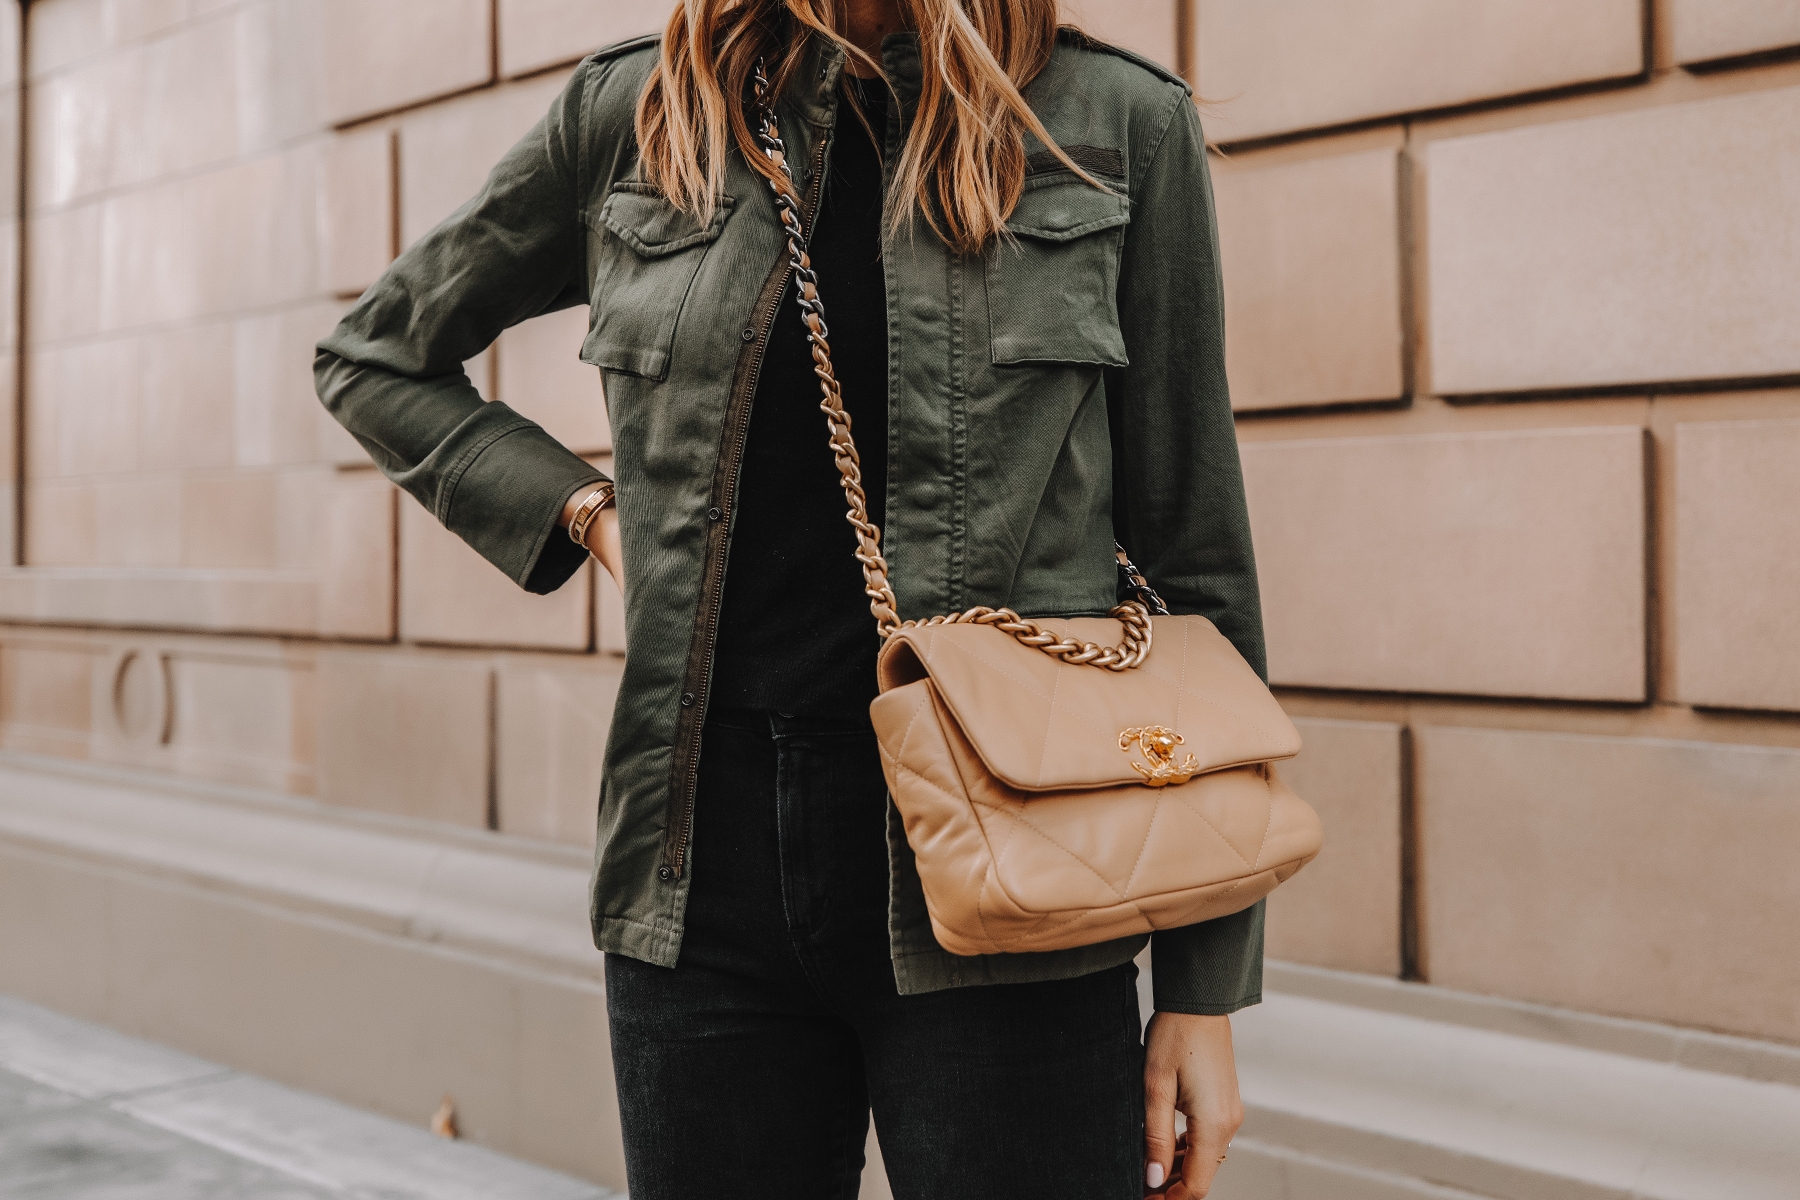 Fashion Jackson Wearing Anine Bing Green Utility Jacket Chanel 19 Small Dark Beige Handbag